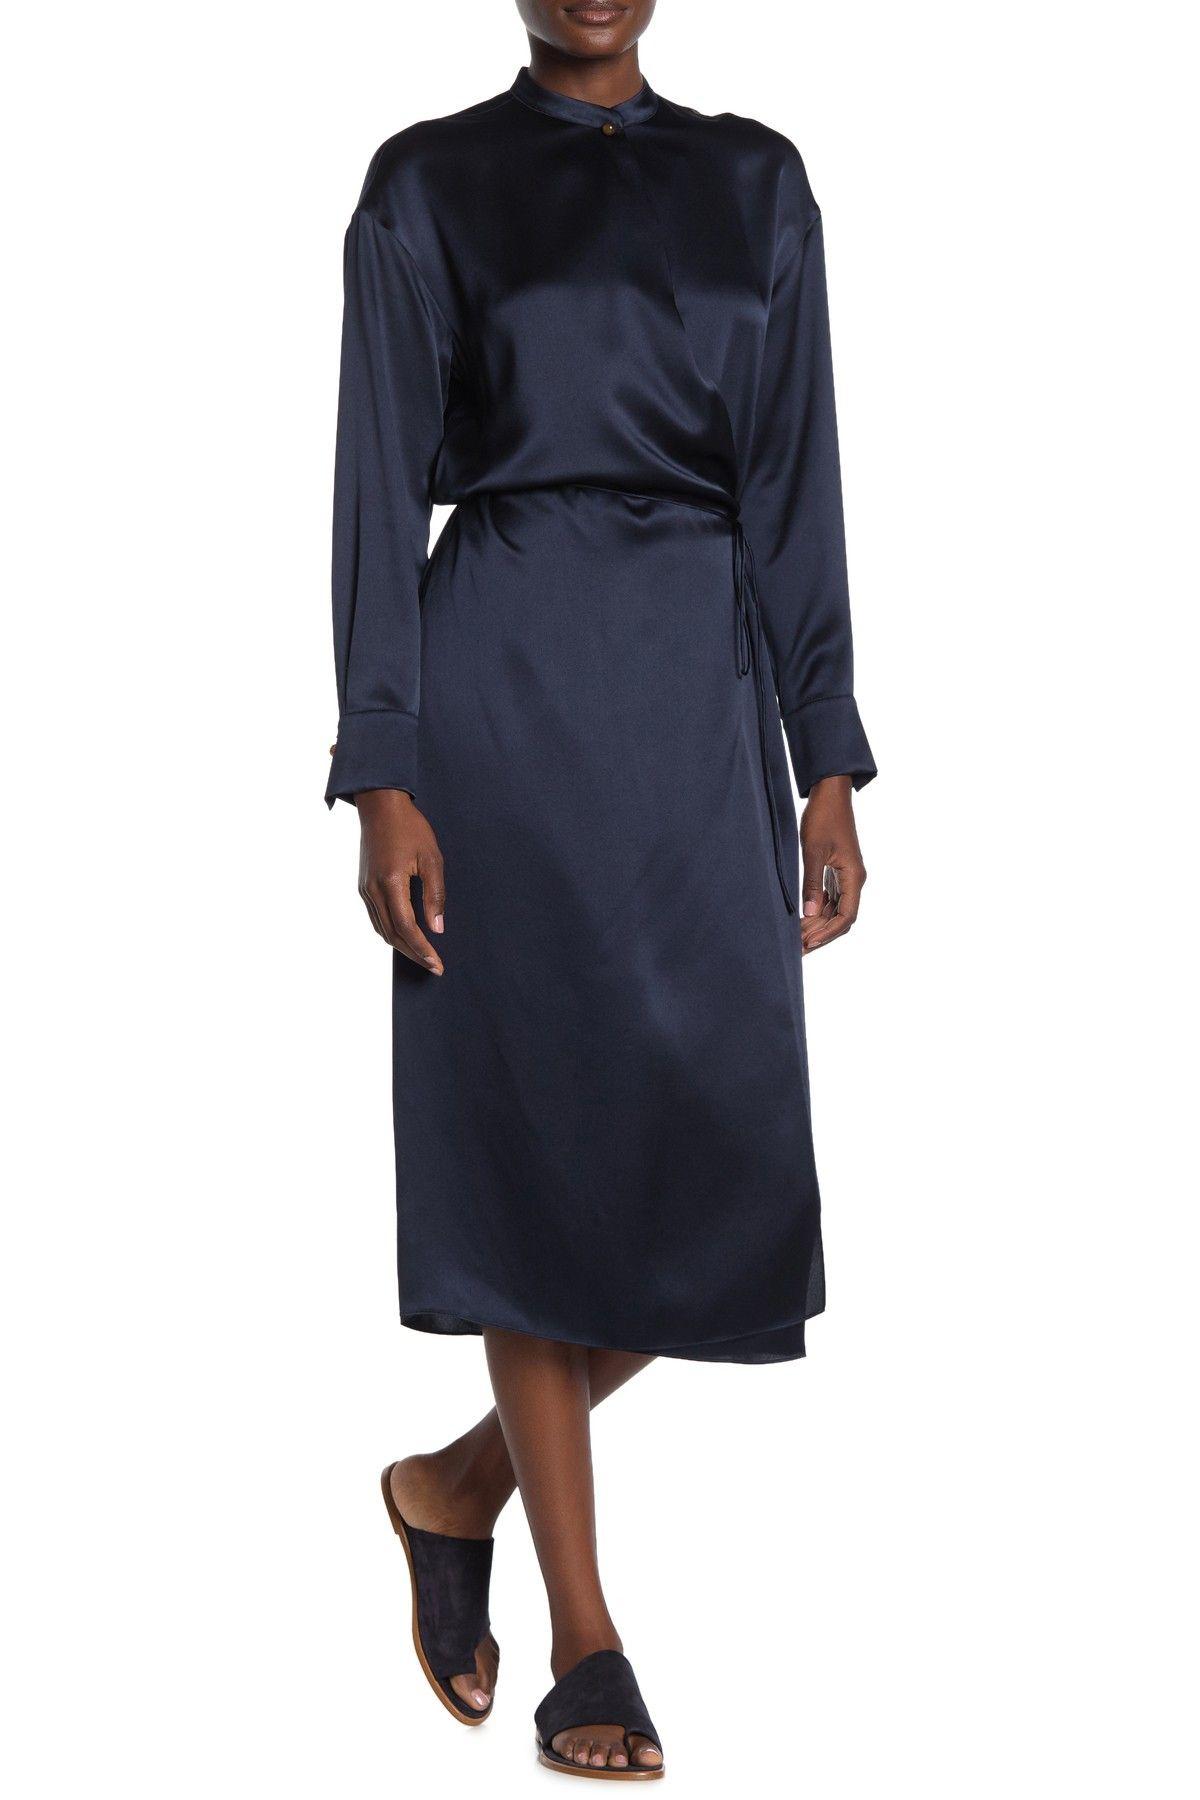 Vince Long Sleeve Silk Wrap Dress Nordstrom Rack Silk Wrap Dresses Wrap Dress Aesthetic Clothes [ 1800 x 1200 Pixel ]